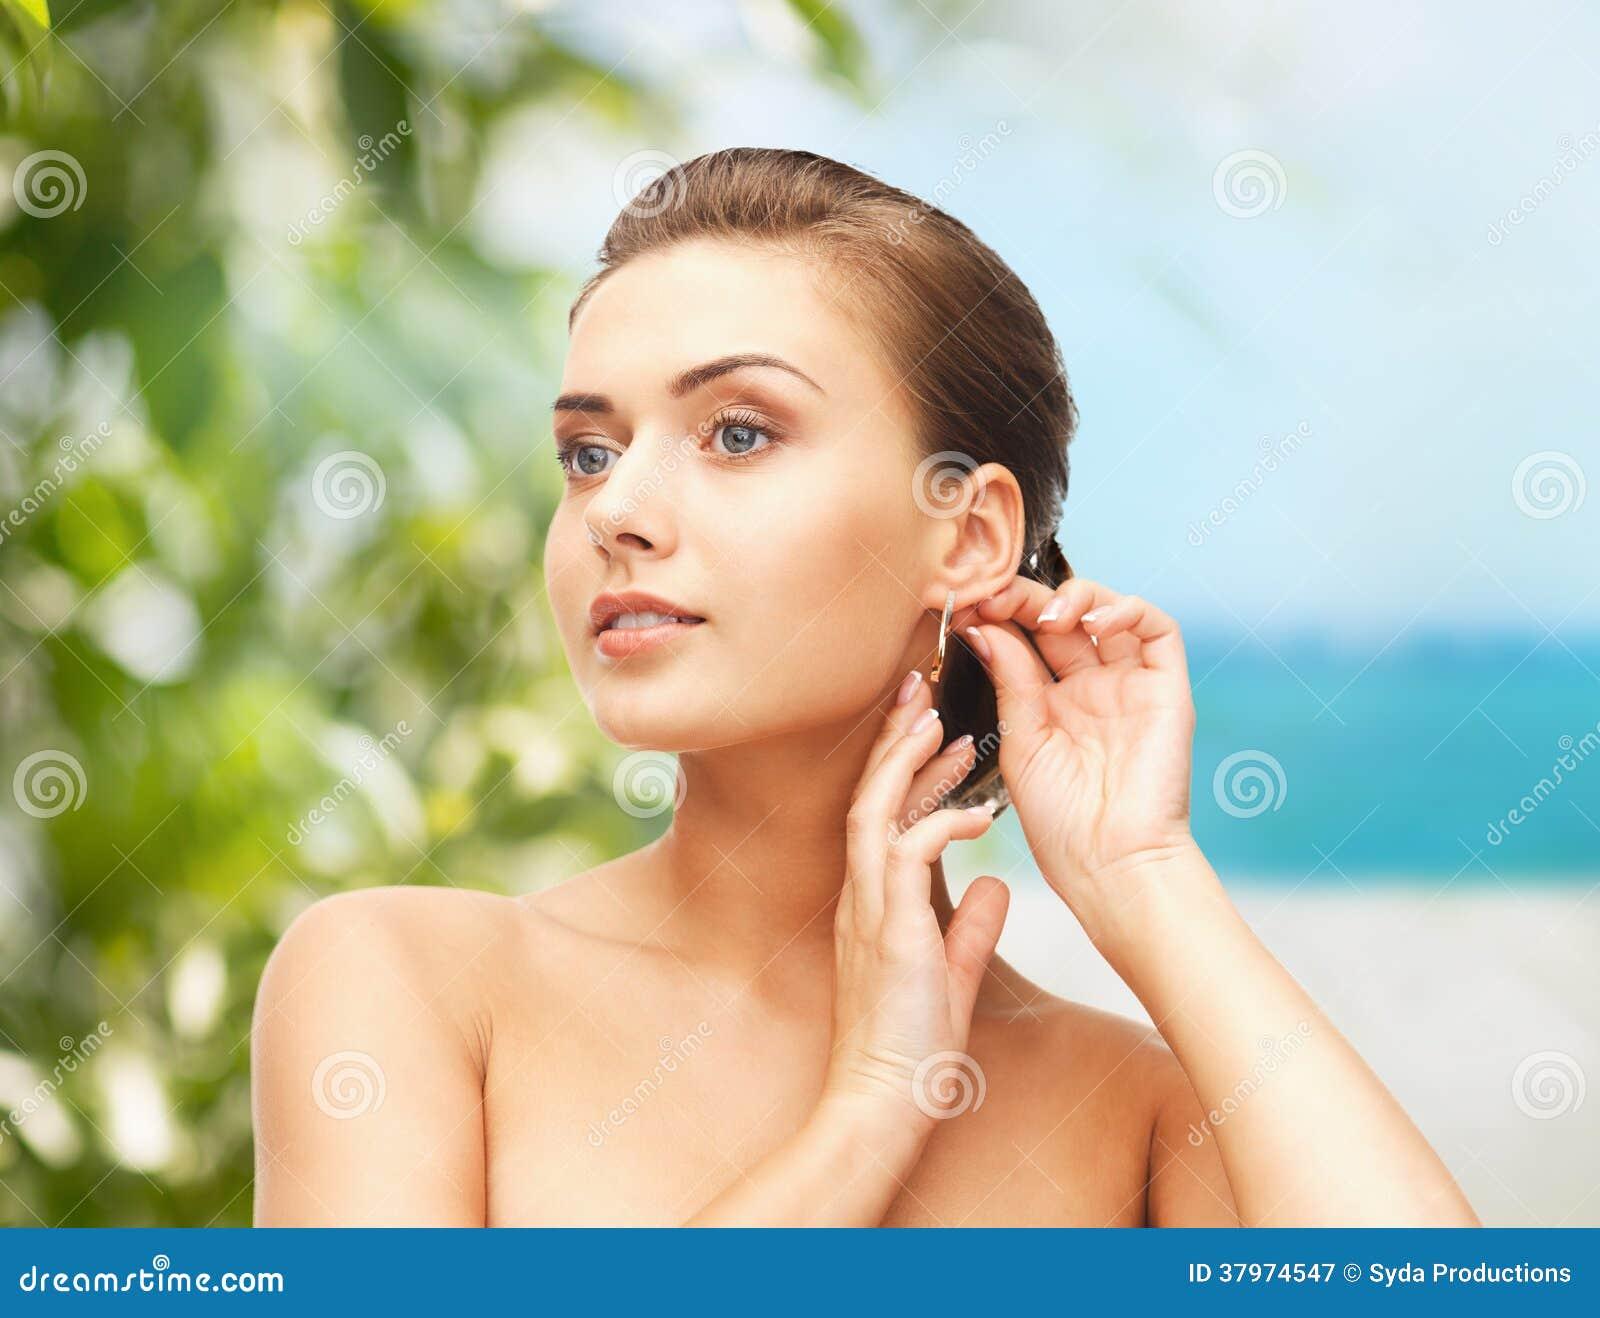 Beautiful woman trying on gold earrings